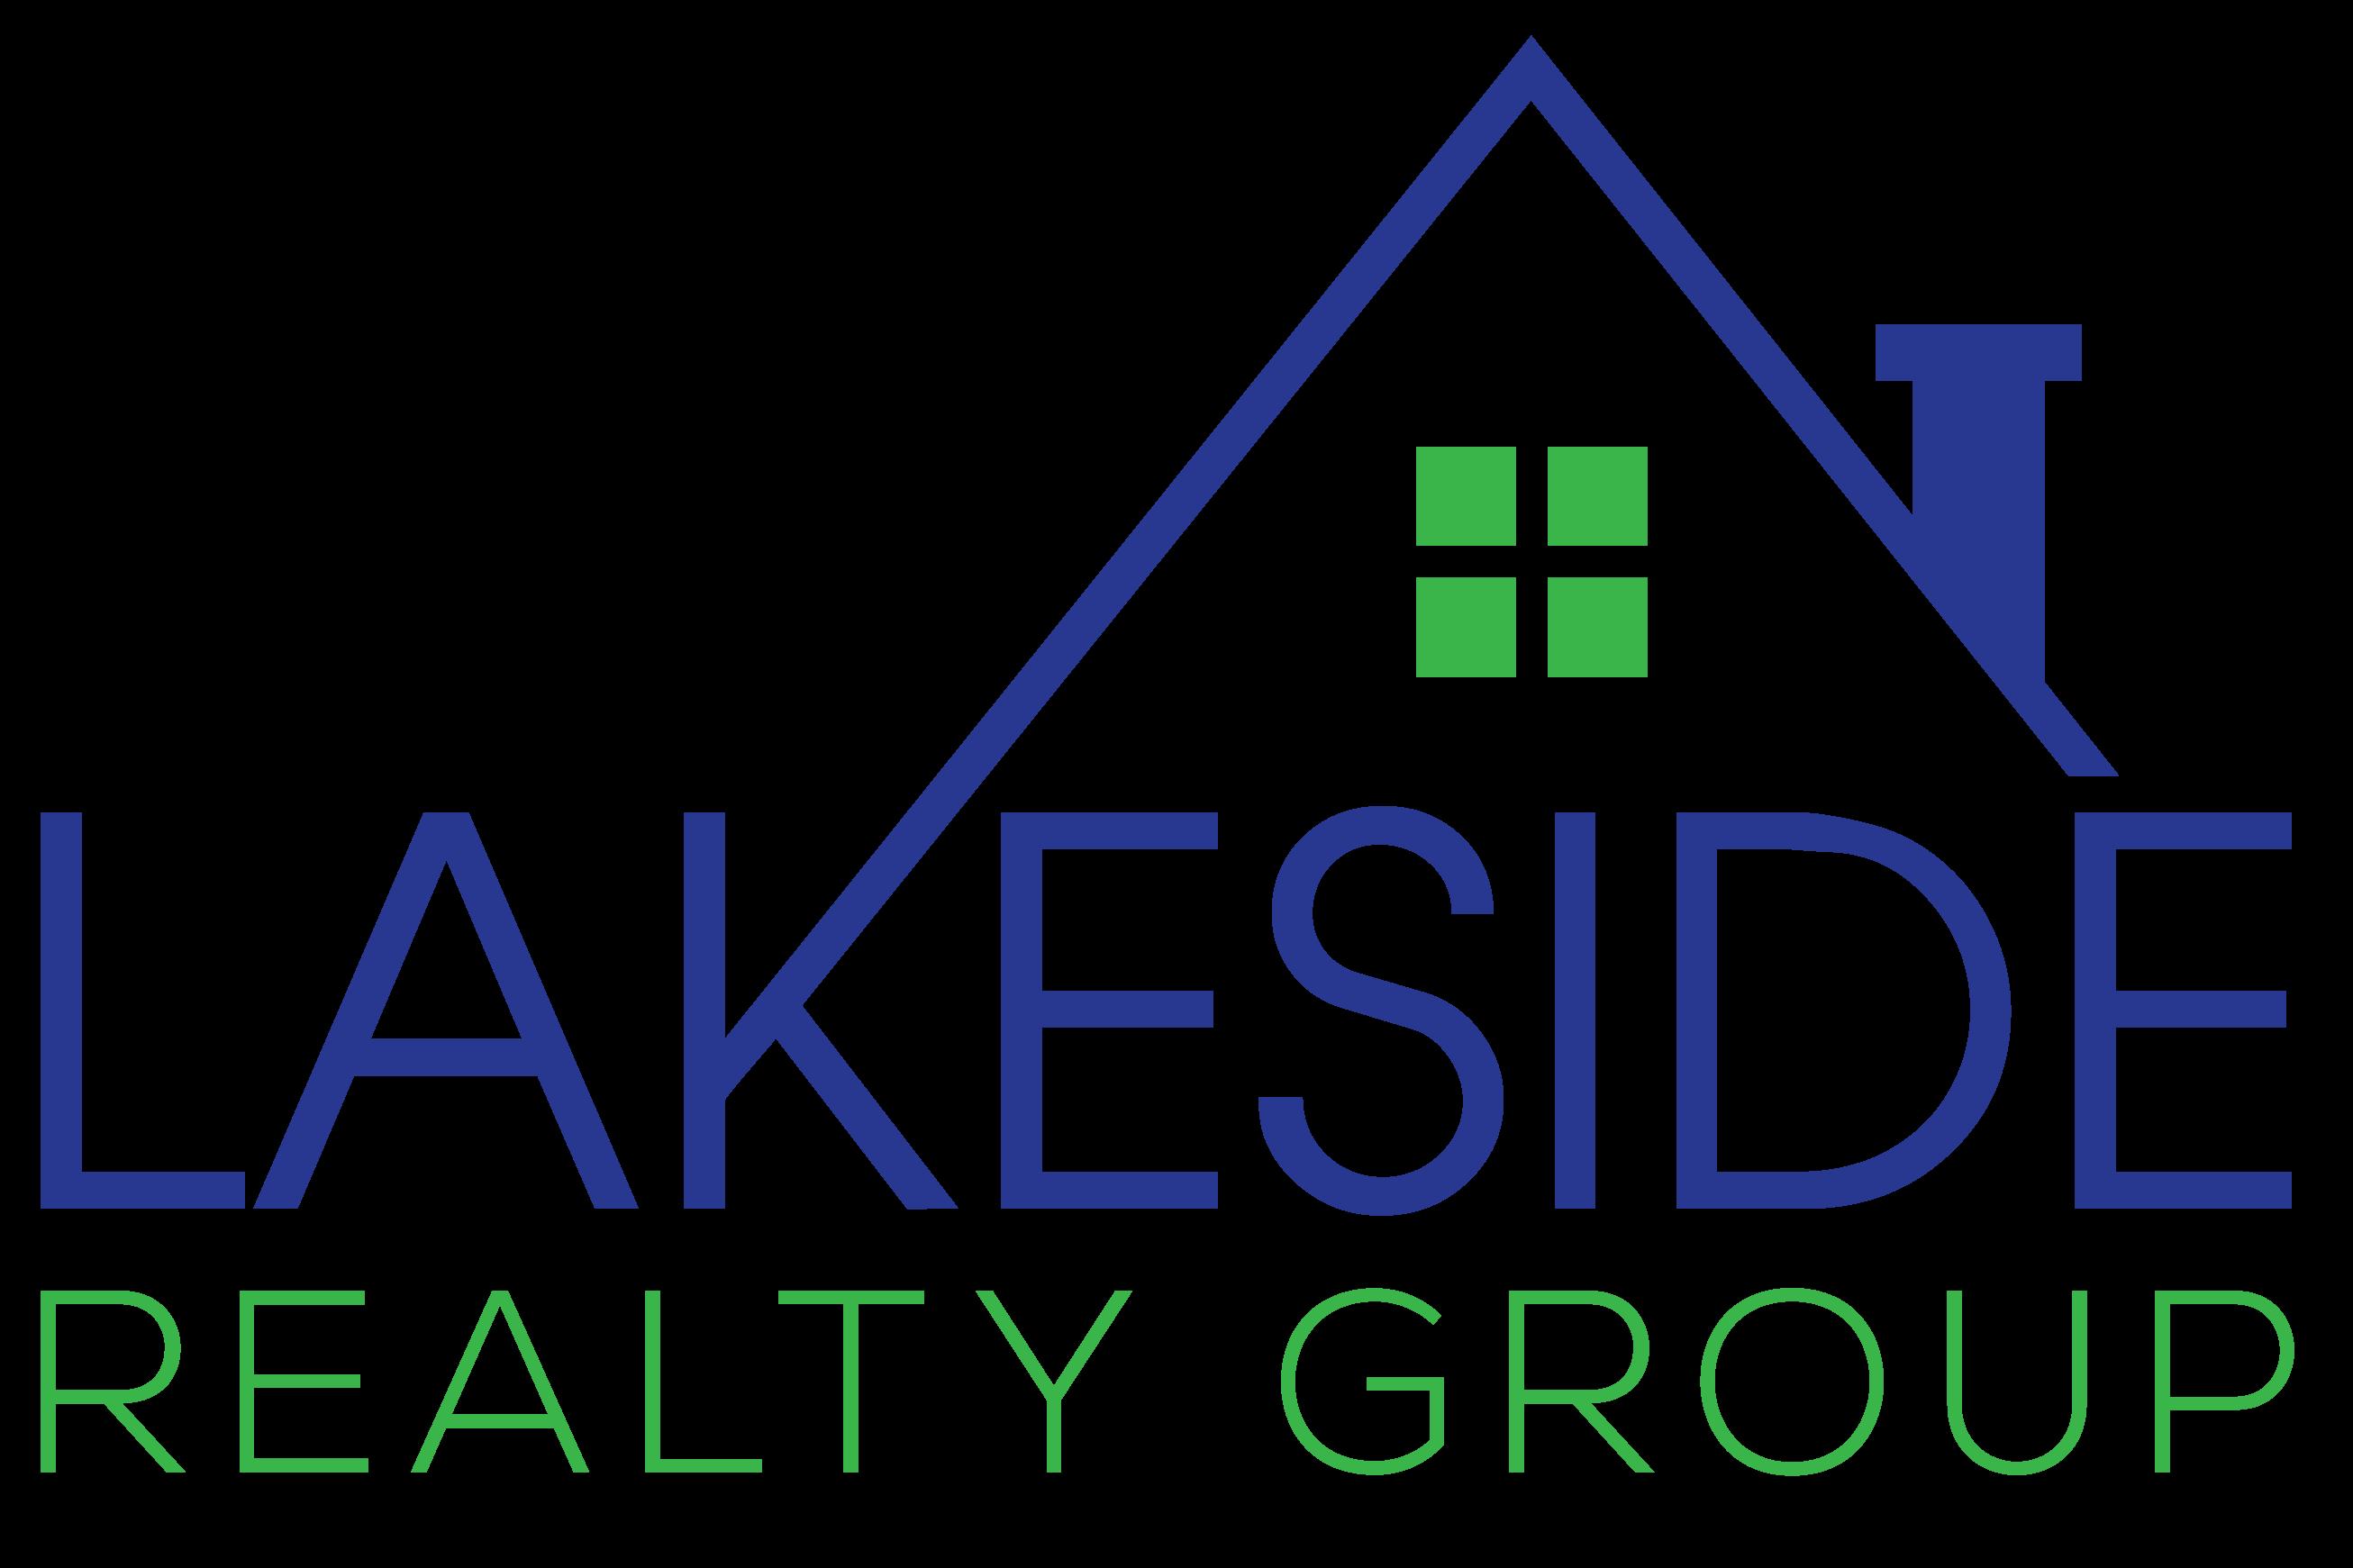 Lakeside Realty Group Logo